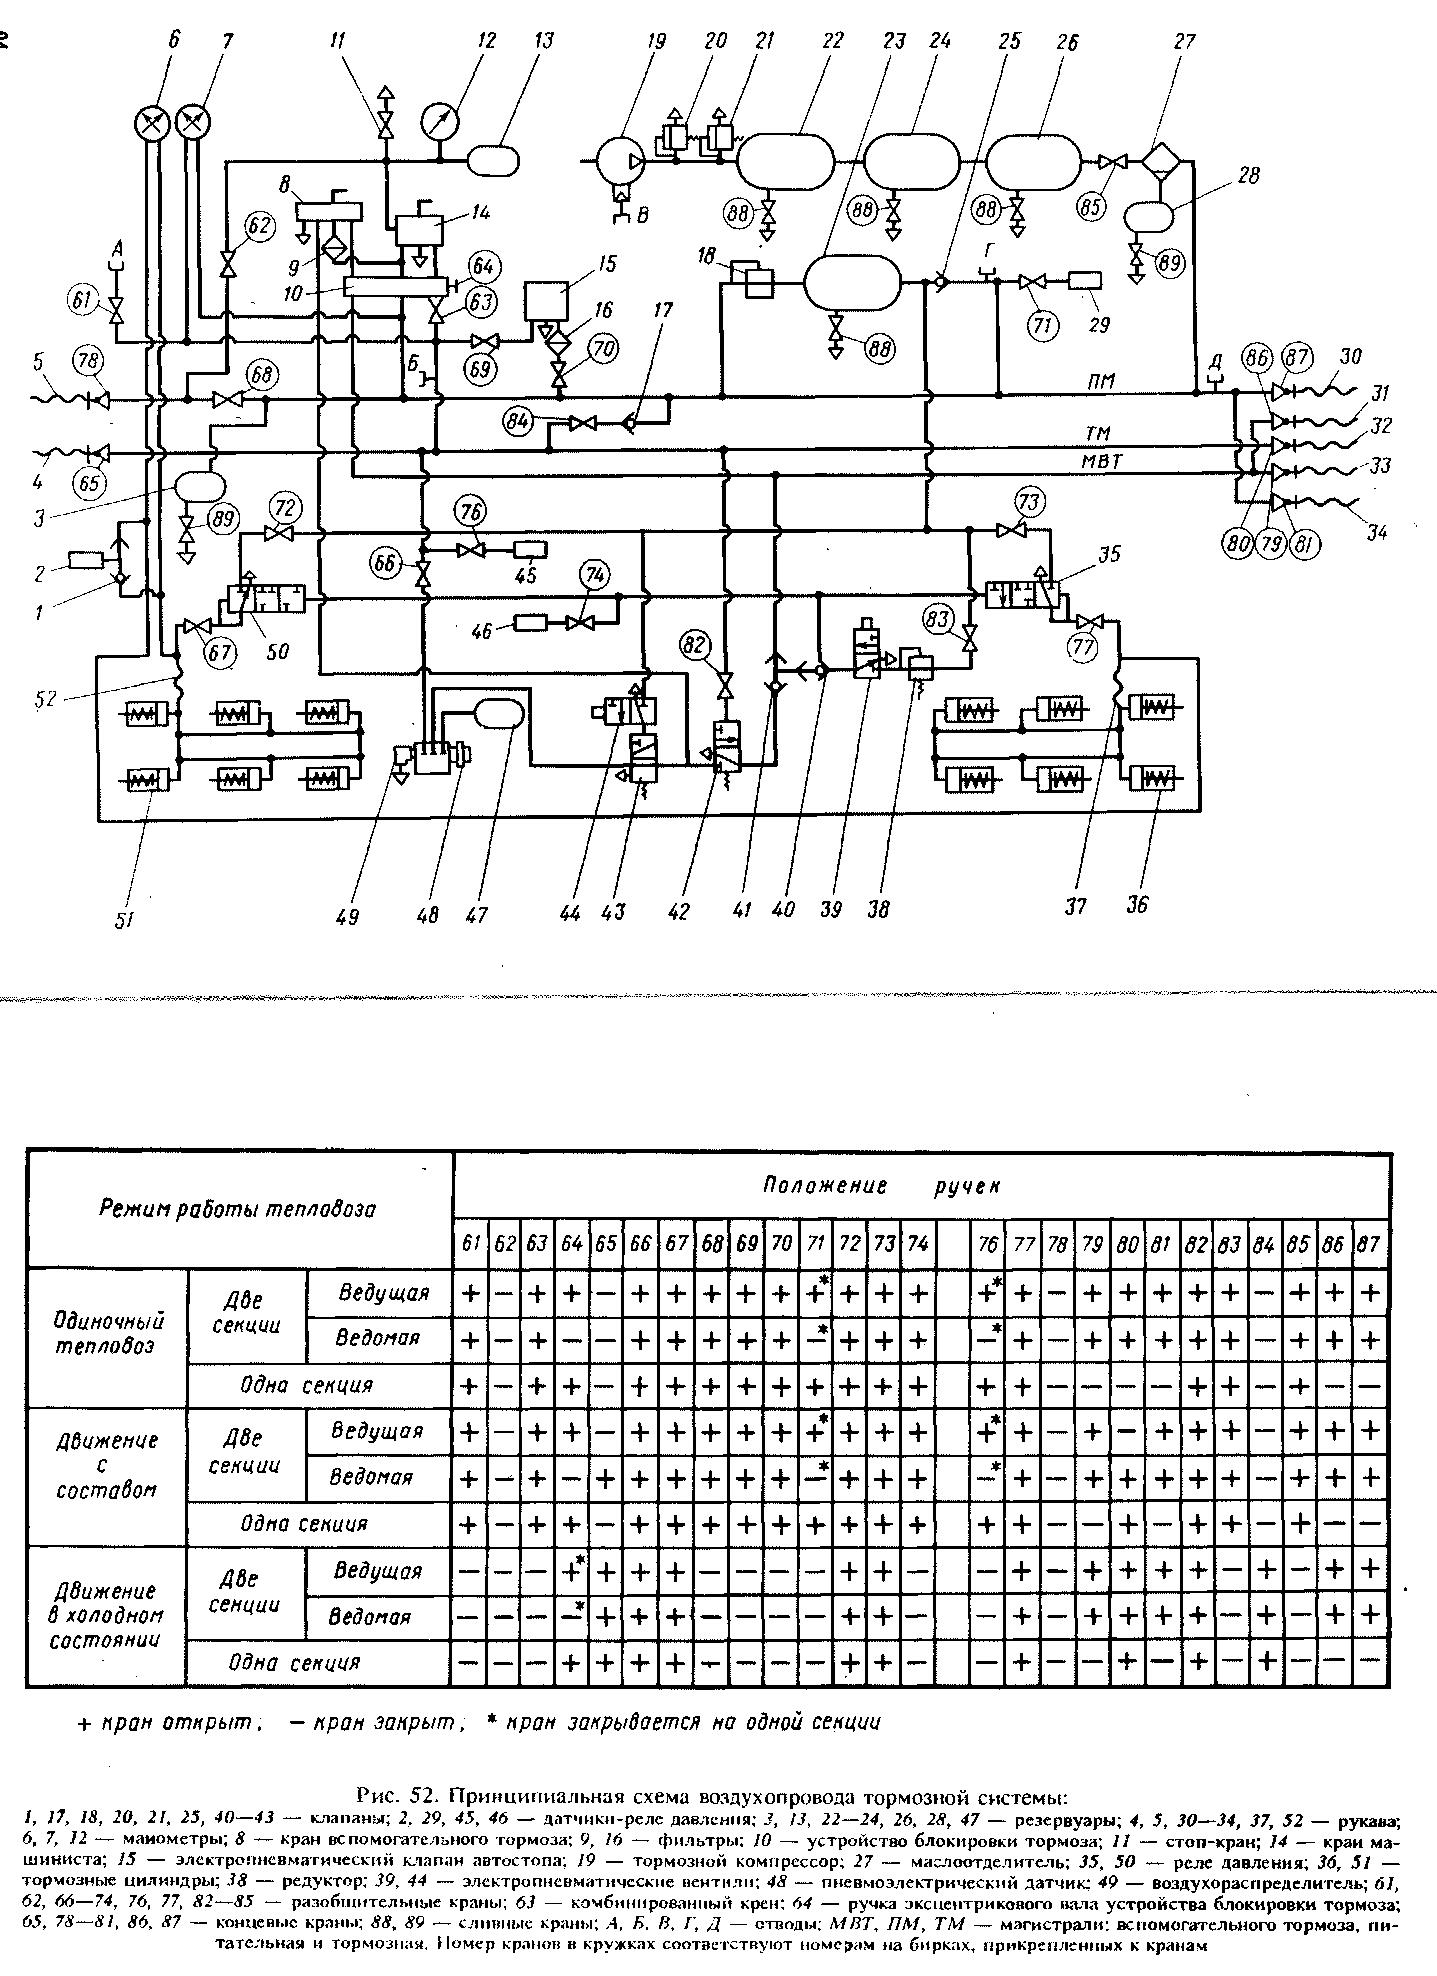 схема запуска тепловоза 2тэ116